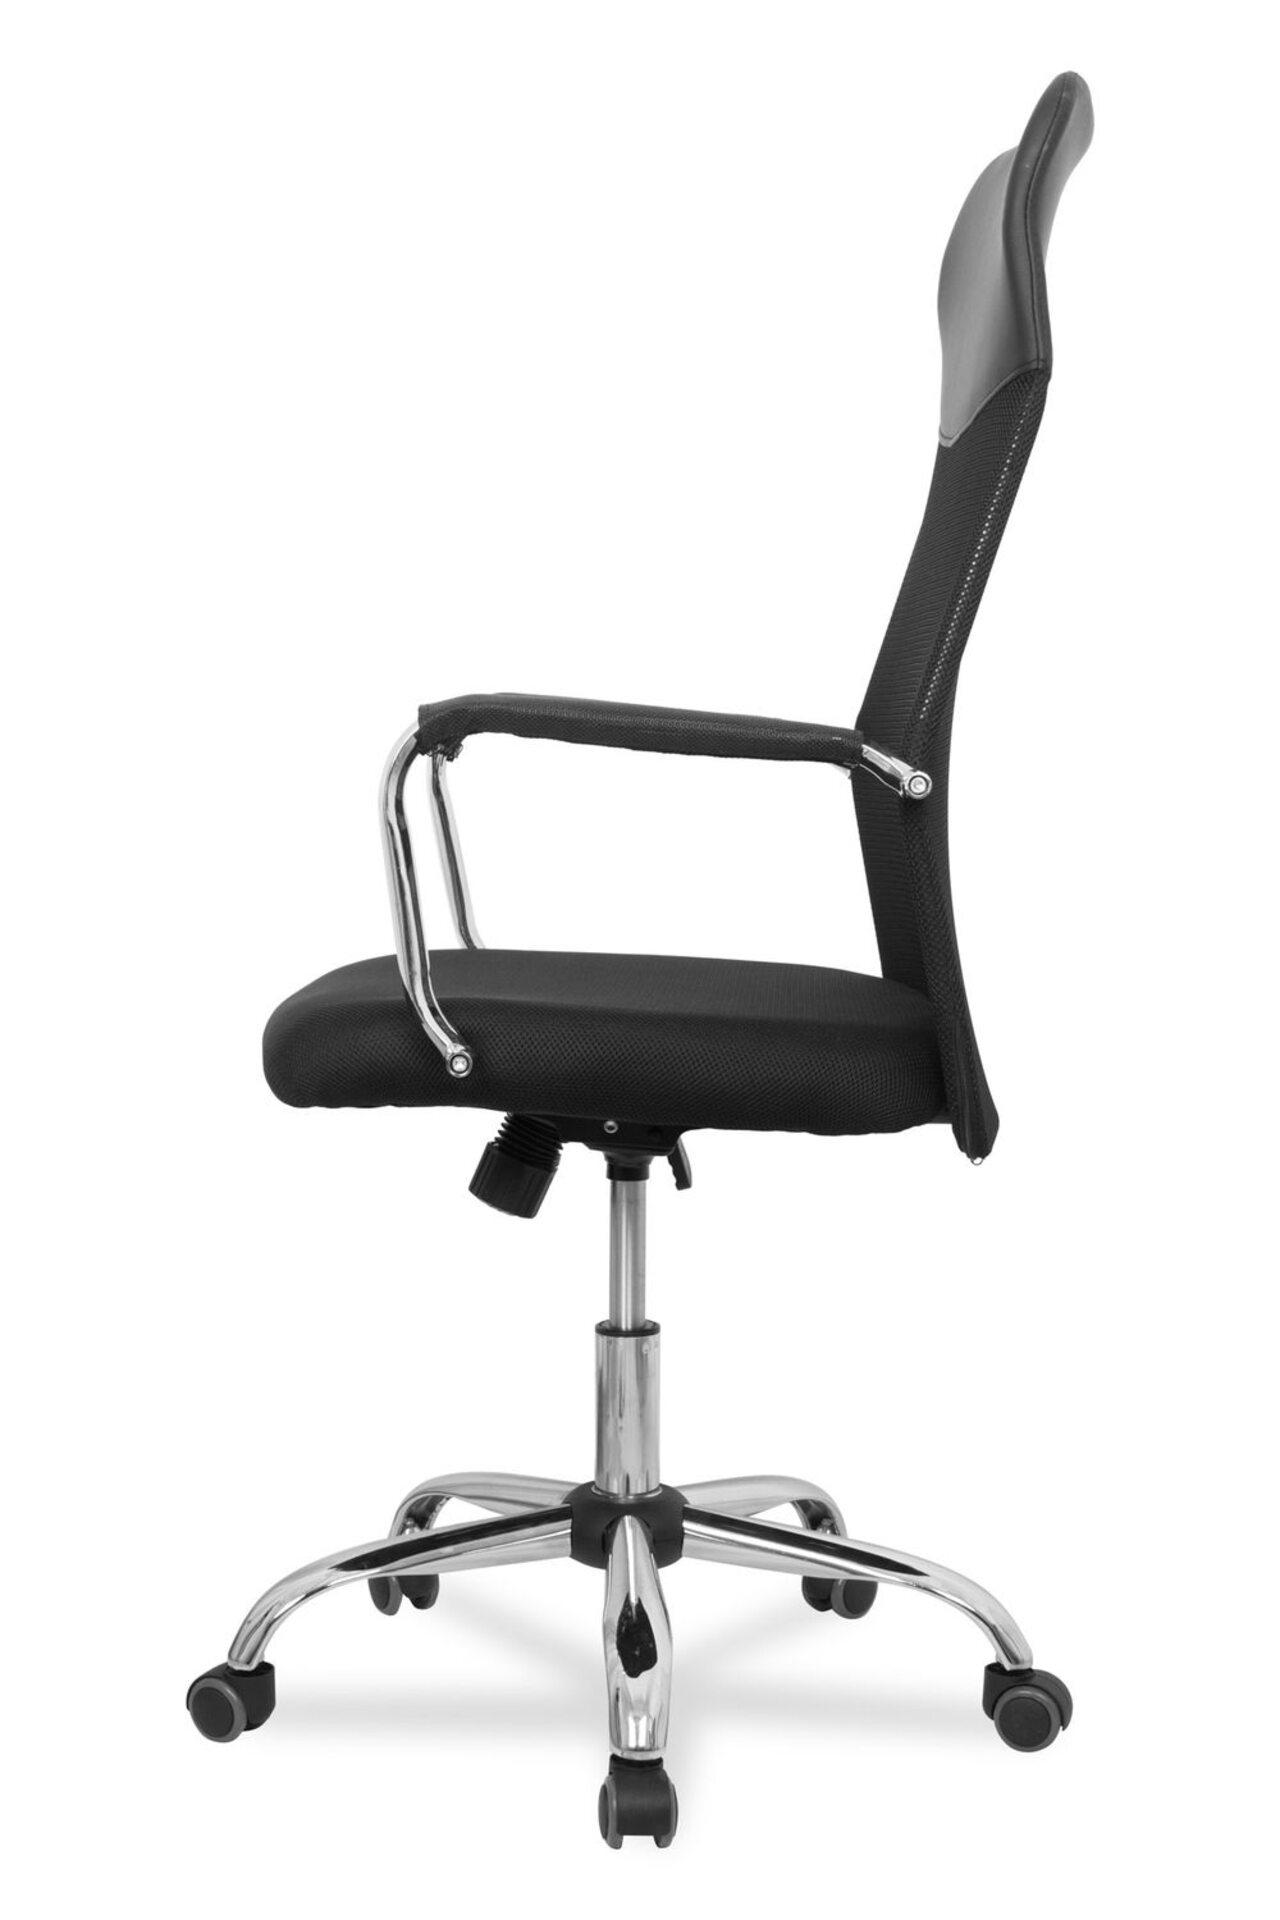 Кресло руководителя College CLG-419 MХН - фото 4